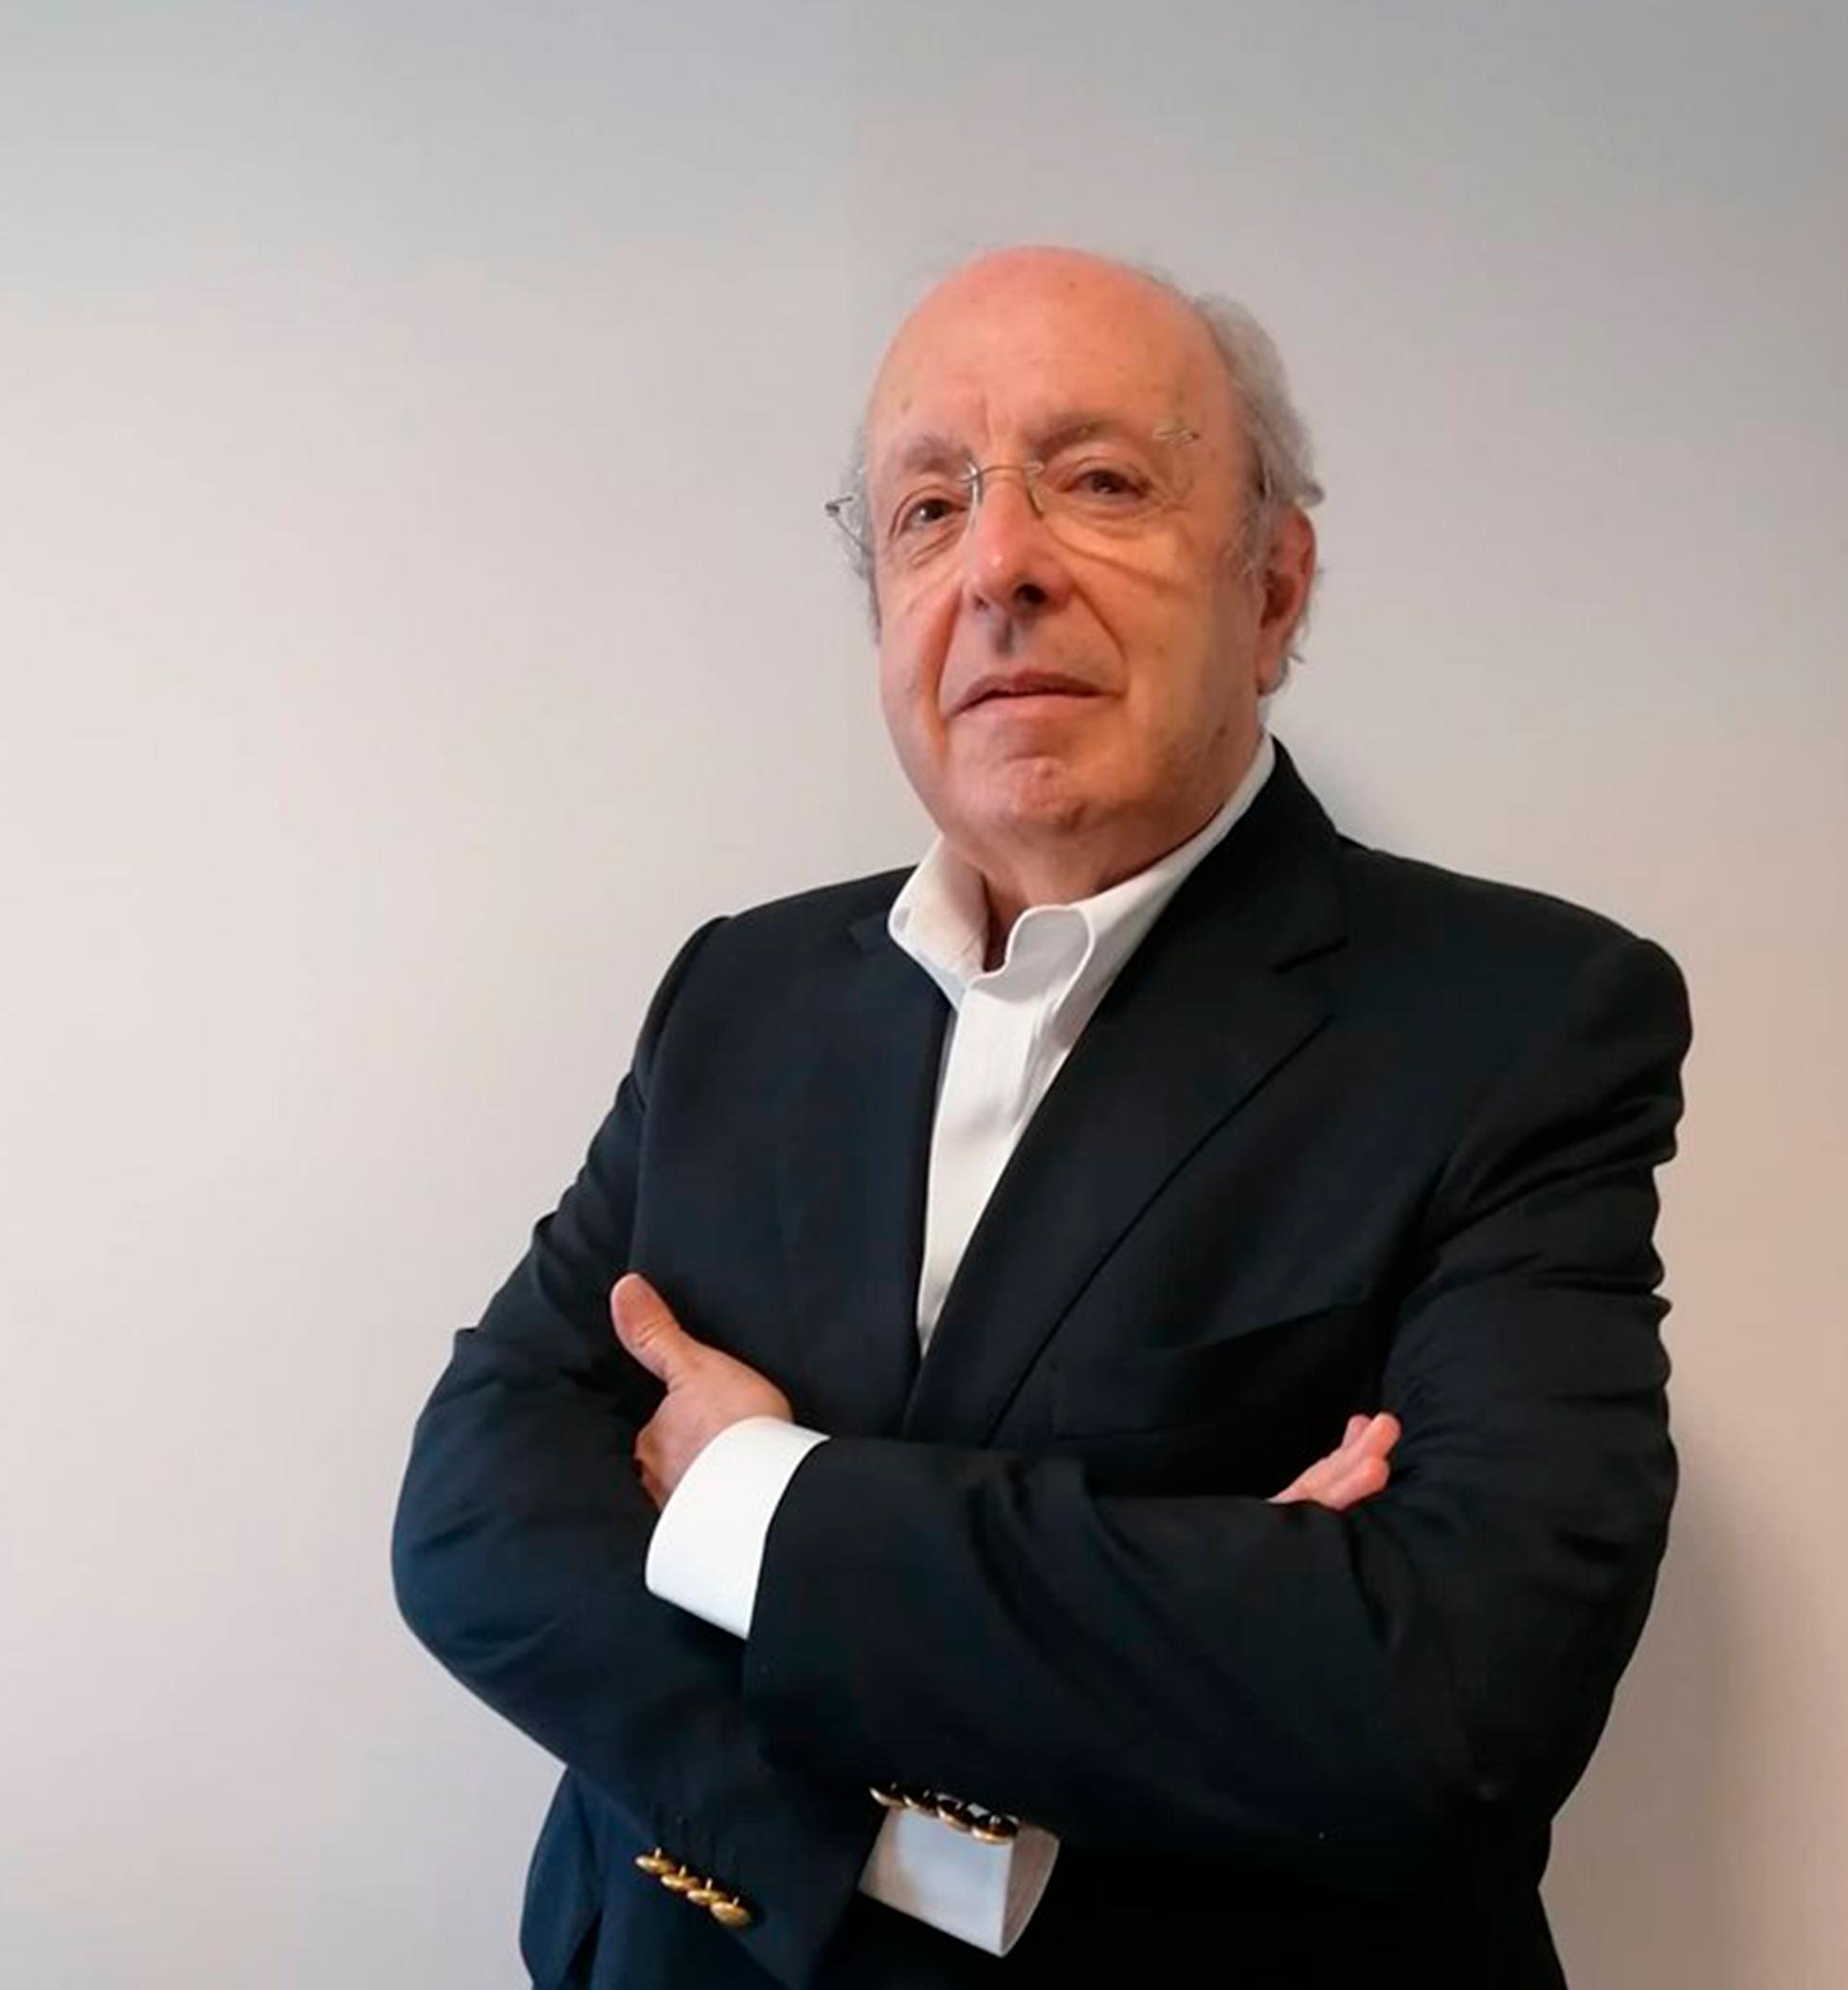 PROFESSOR DOUTOR JOSÉ ALBERTO LOPES COSTA